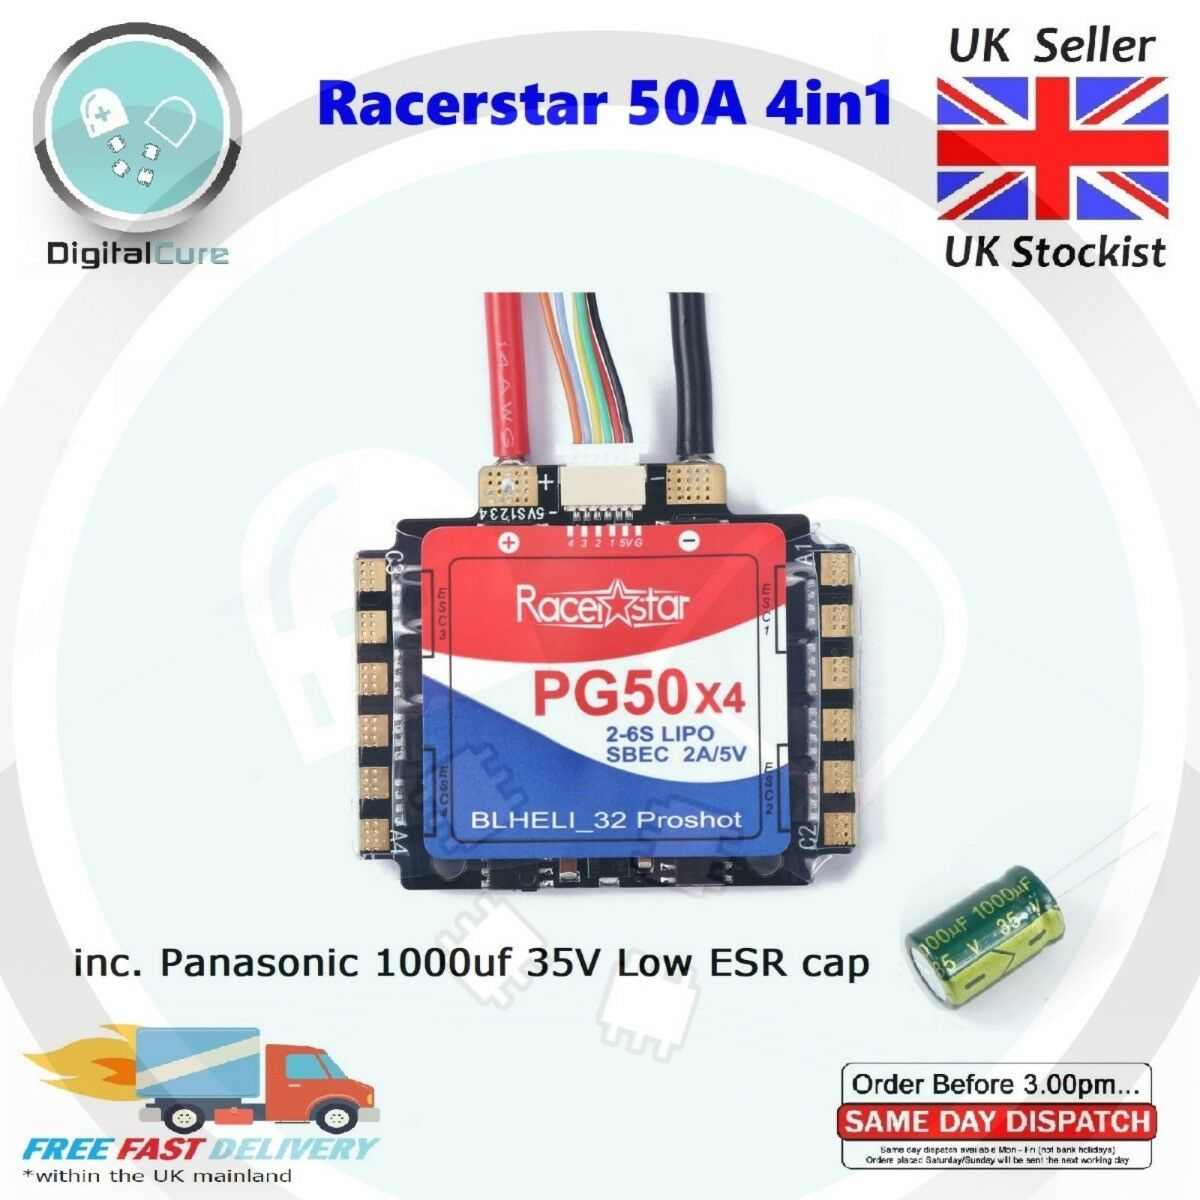 Racerstar PG50x4 50A ESC 4in1 Blheli_32 16.5 2-6S 32bit ProShot 5V BEC - 30A 20A